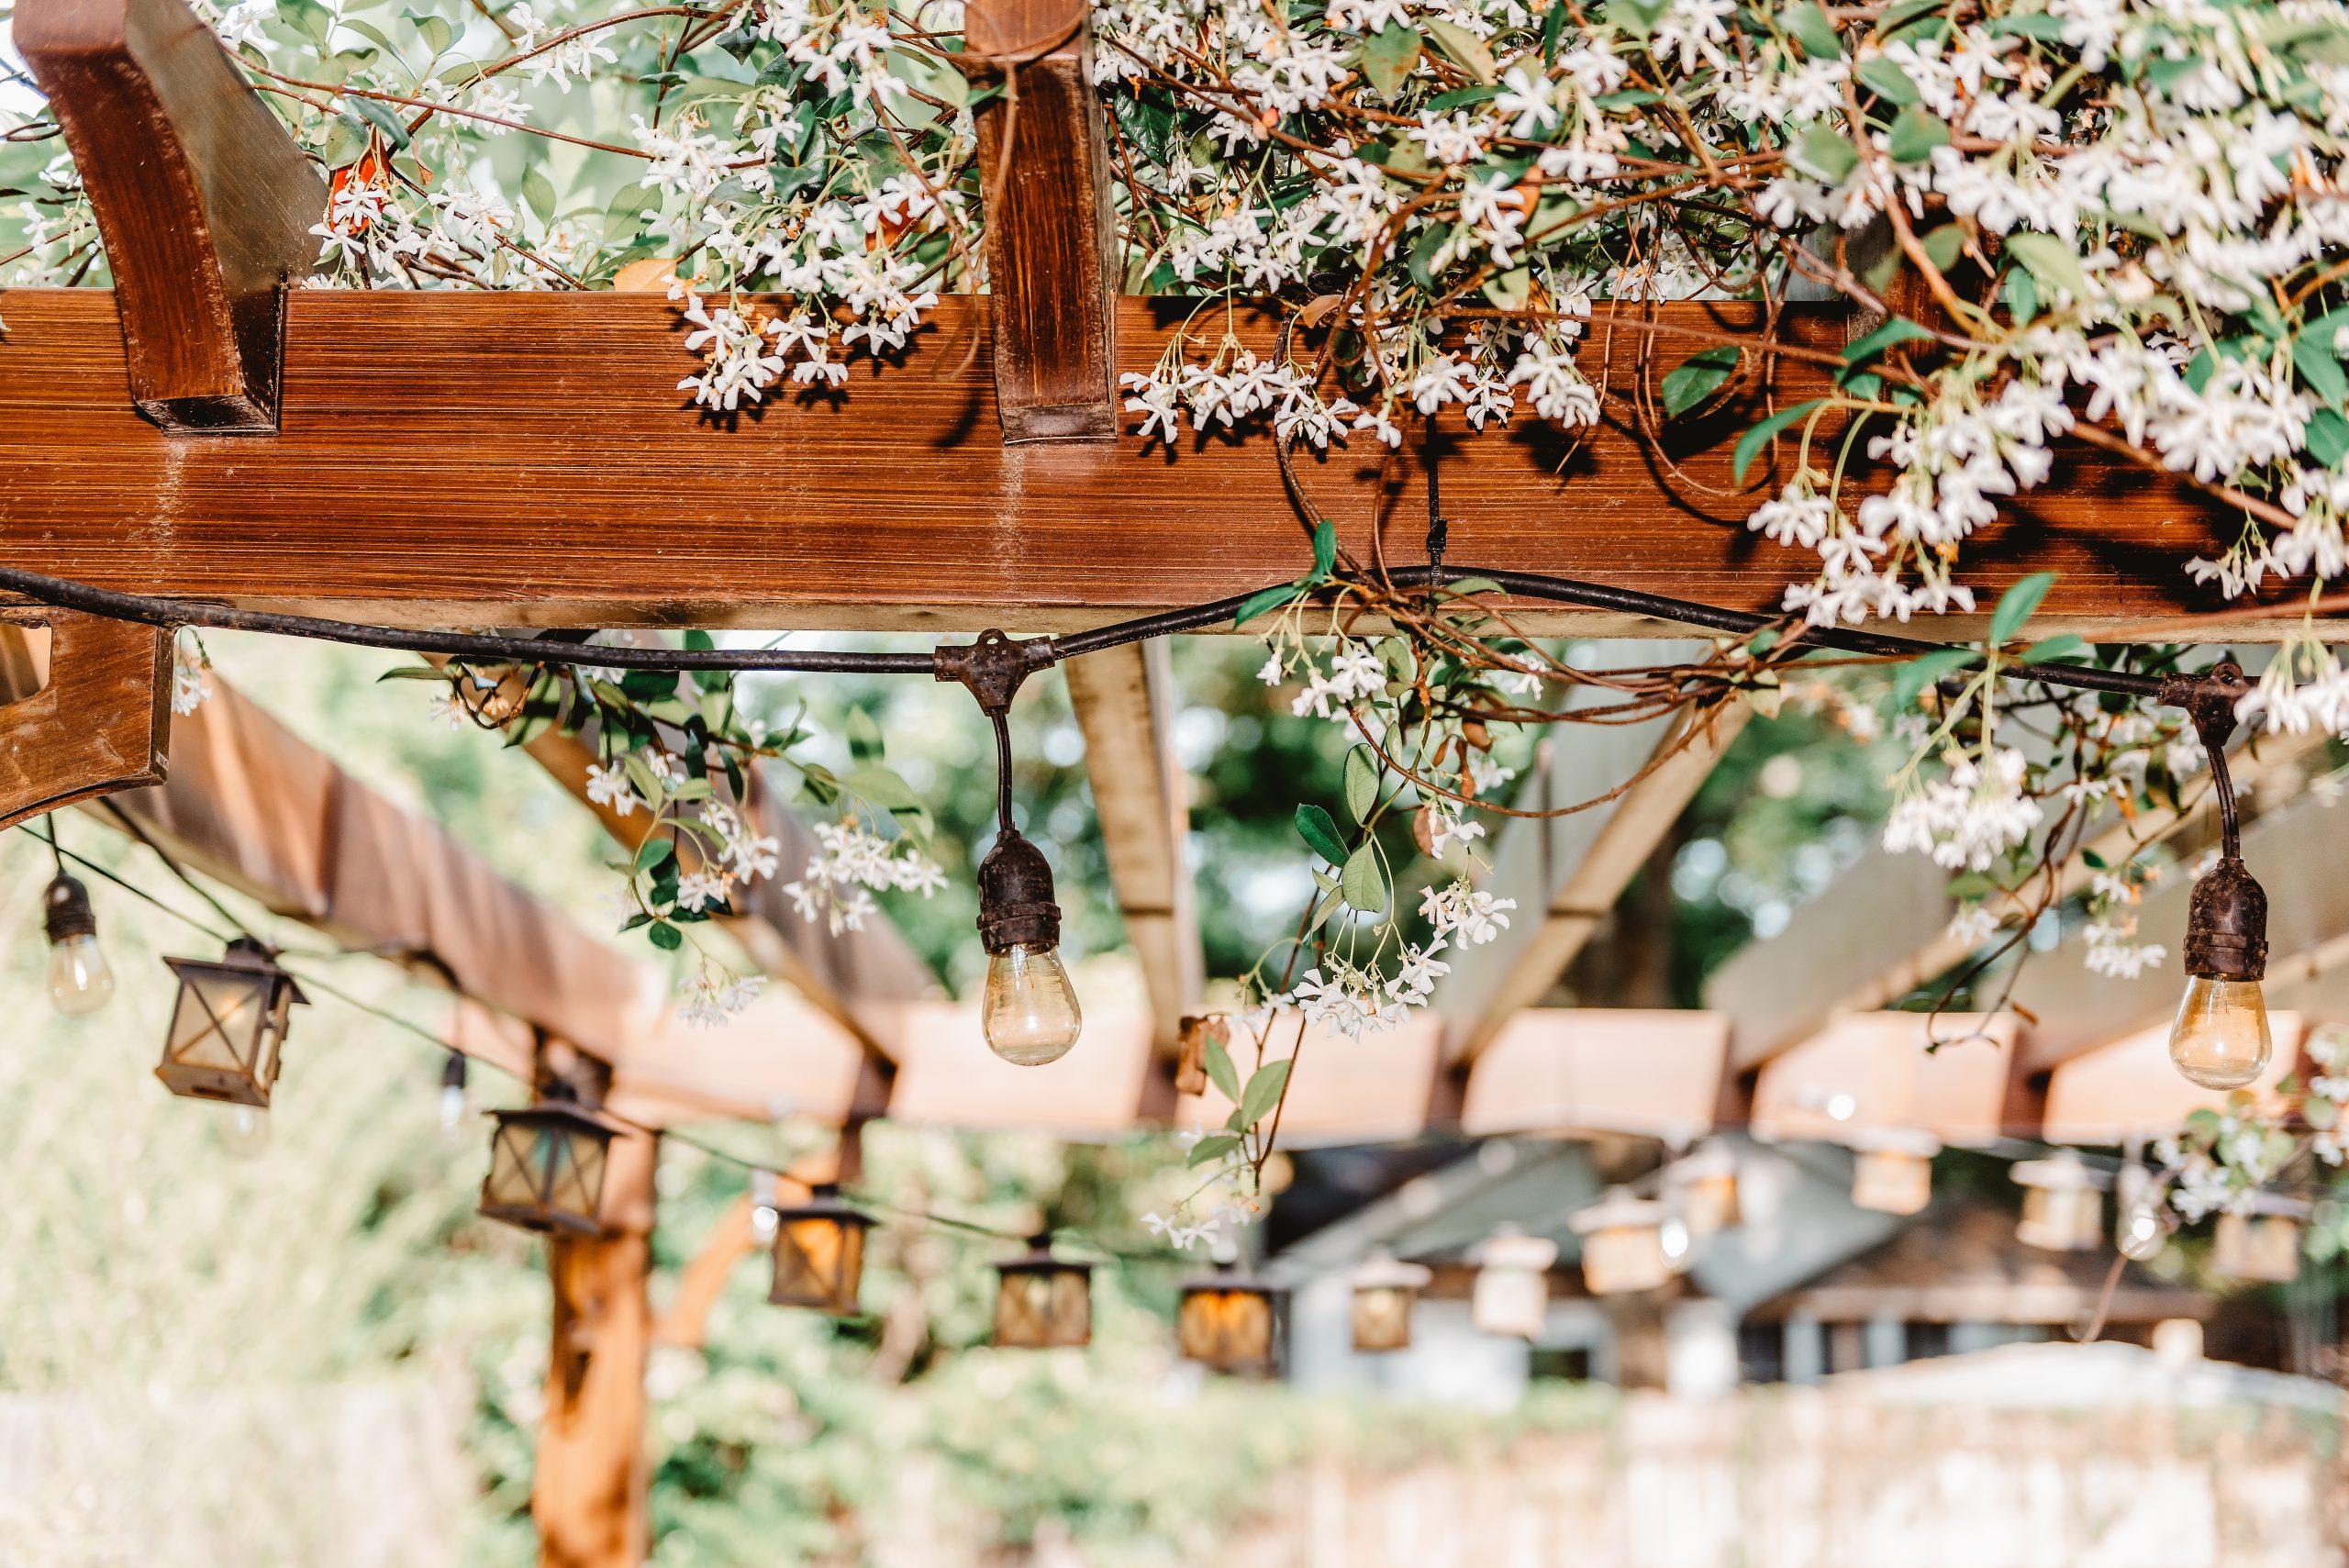 Closeup of patio outdoor spring white flower garden in backyard porch of home, lamps light bulbs, zen with pergola canopy wooden gazebo, plants